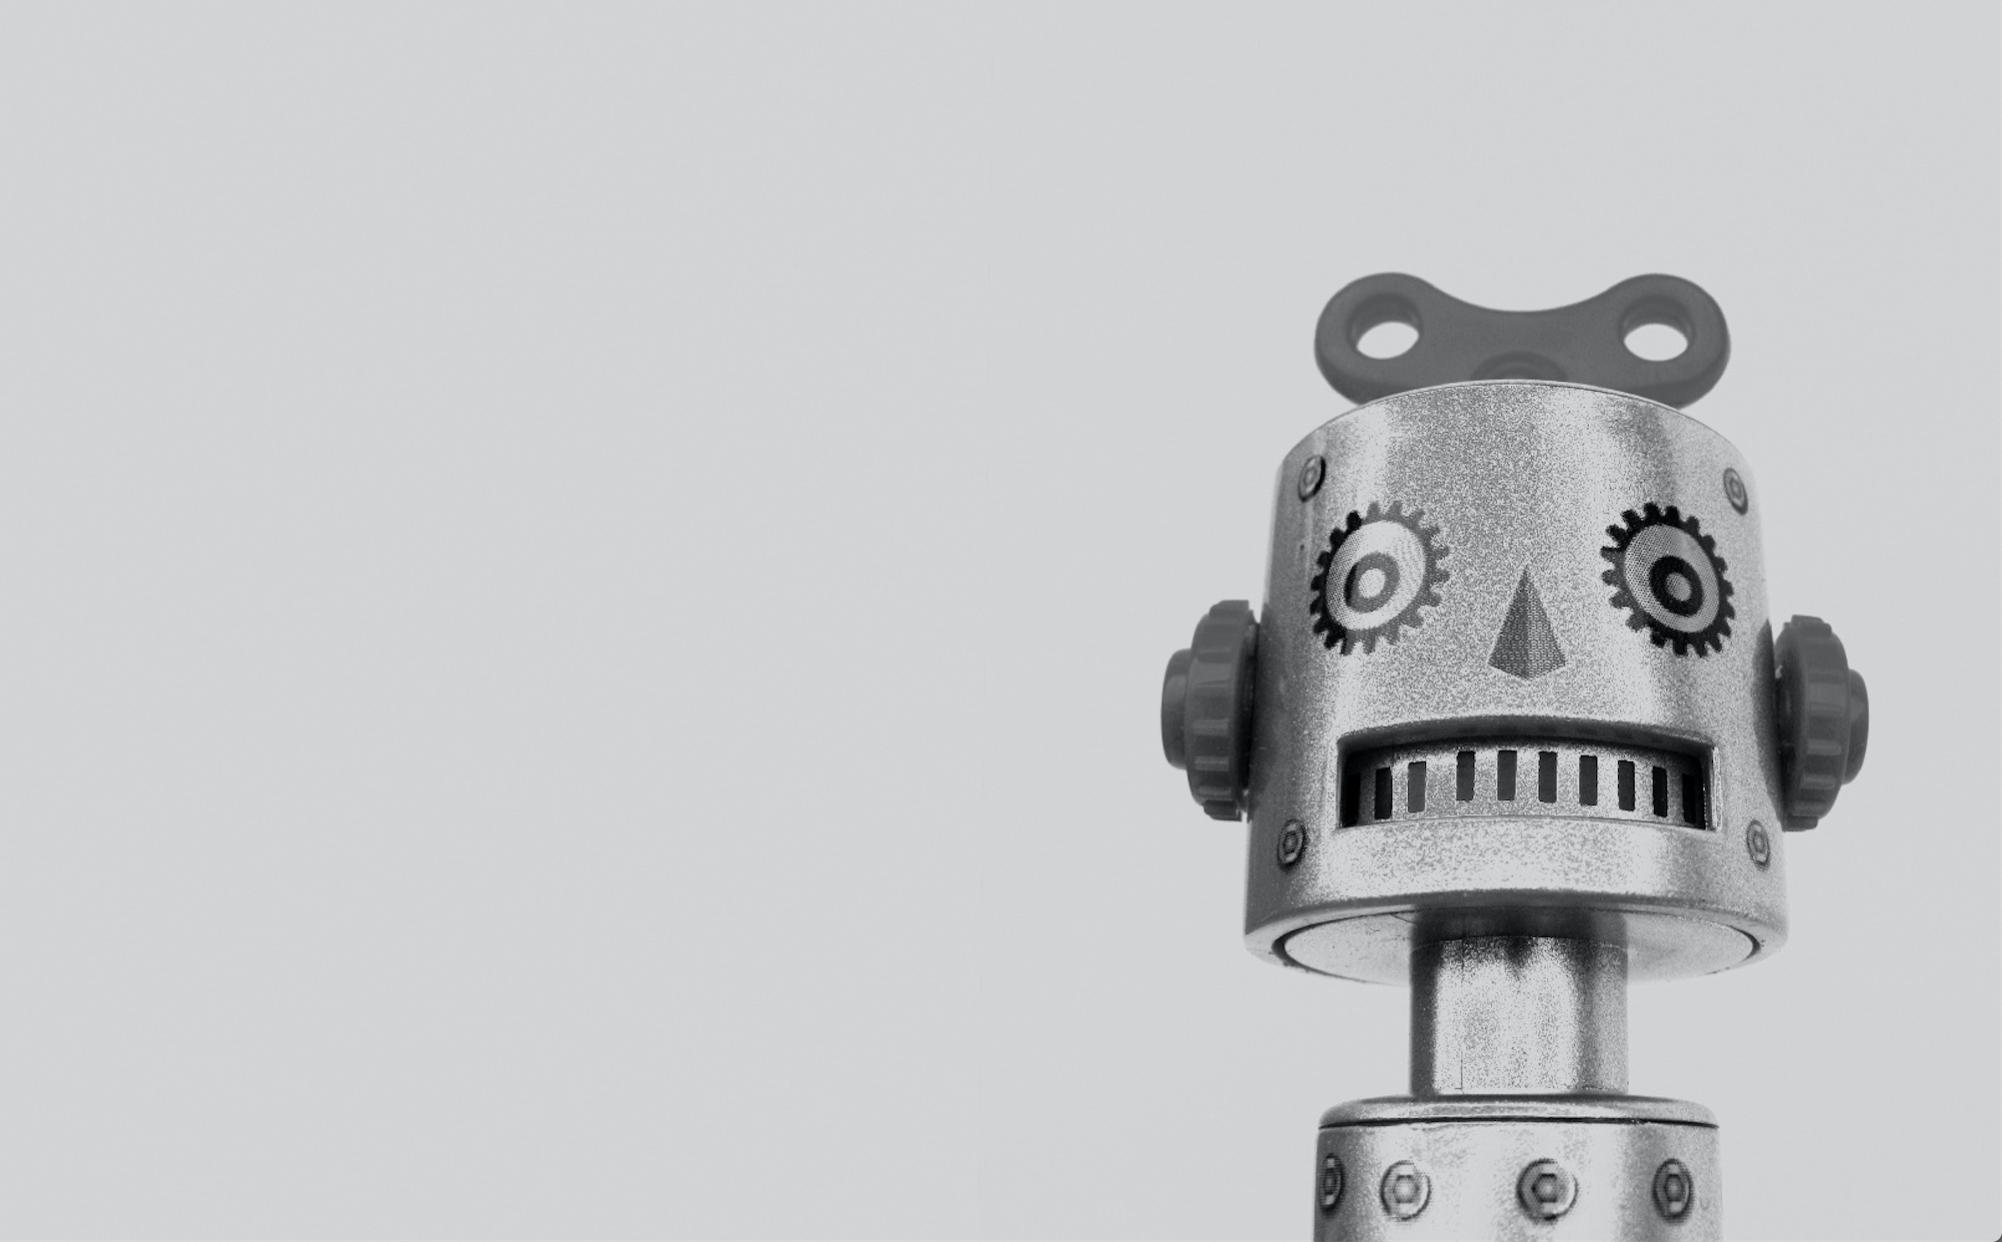 Tecnologia e robótica